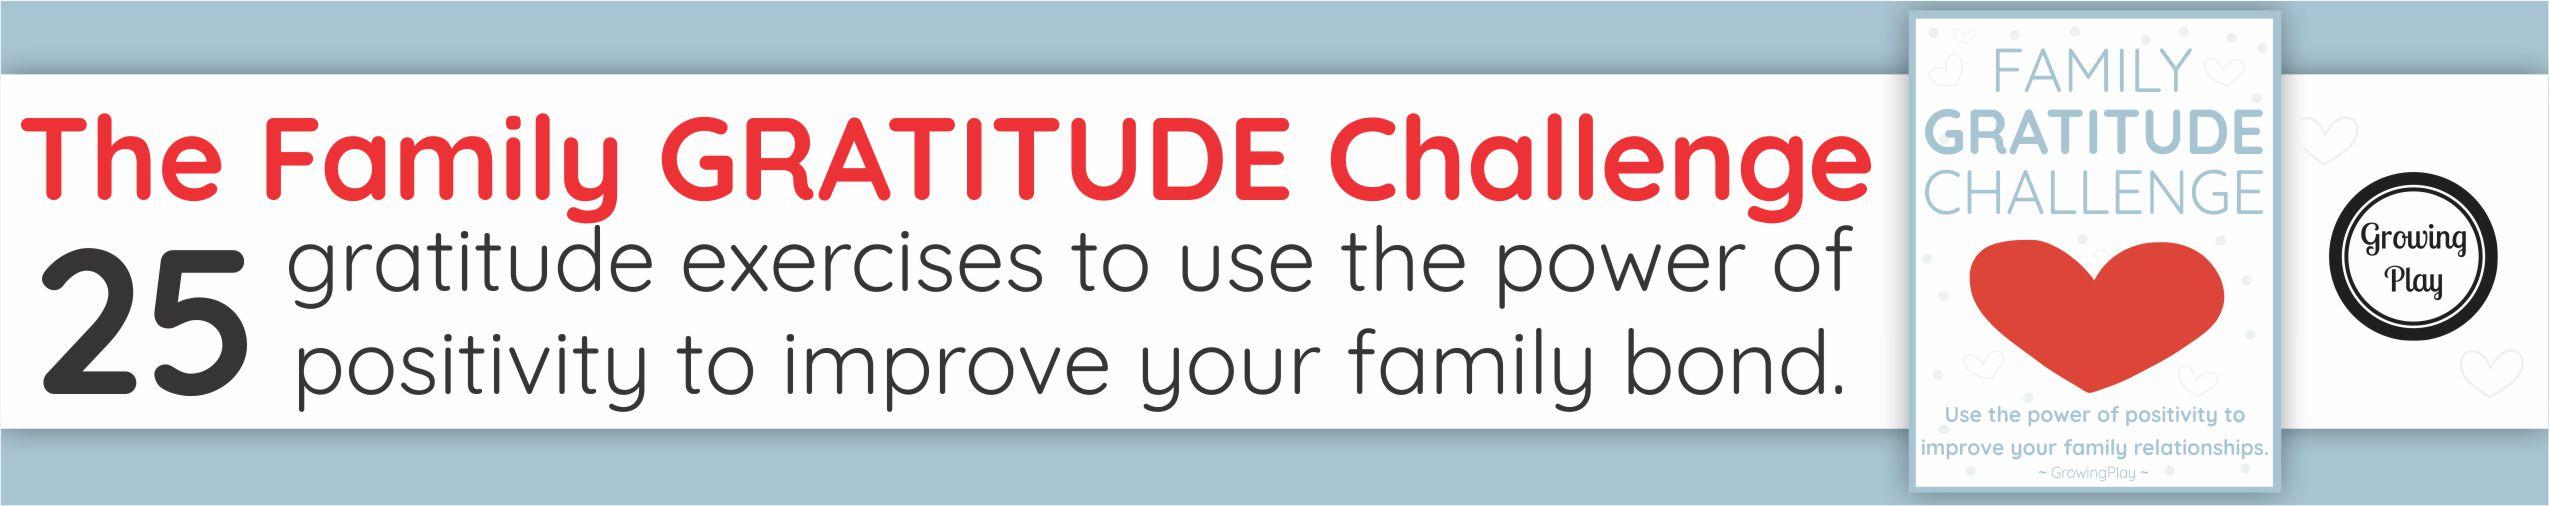 https://www.growingplay.com/product/family-gratitude-challenge-2/